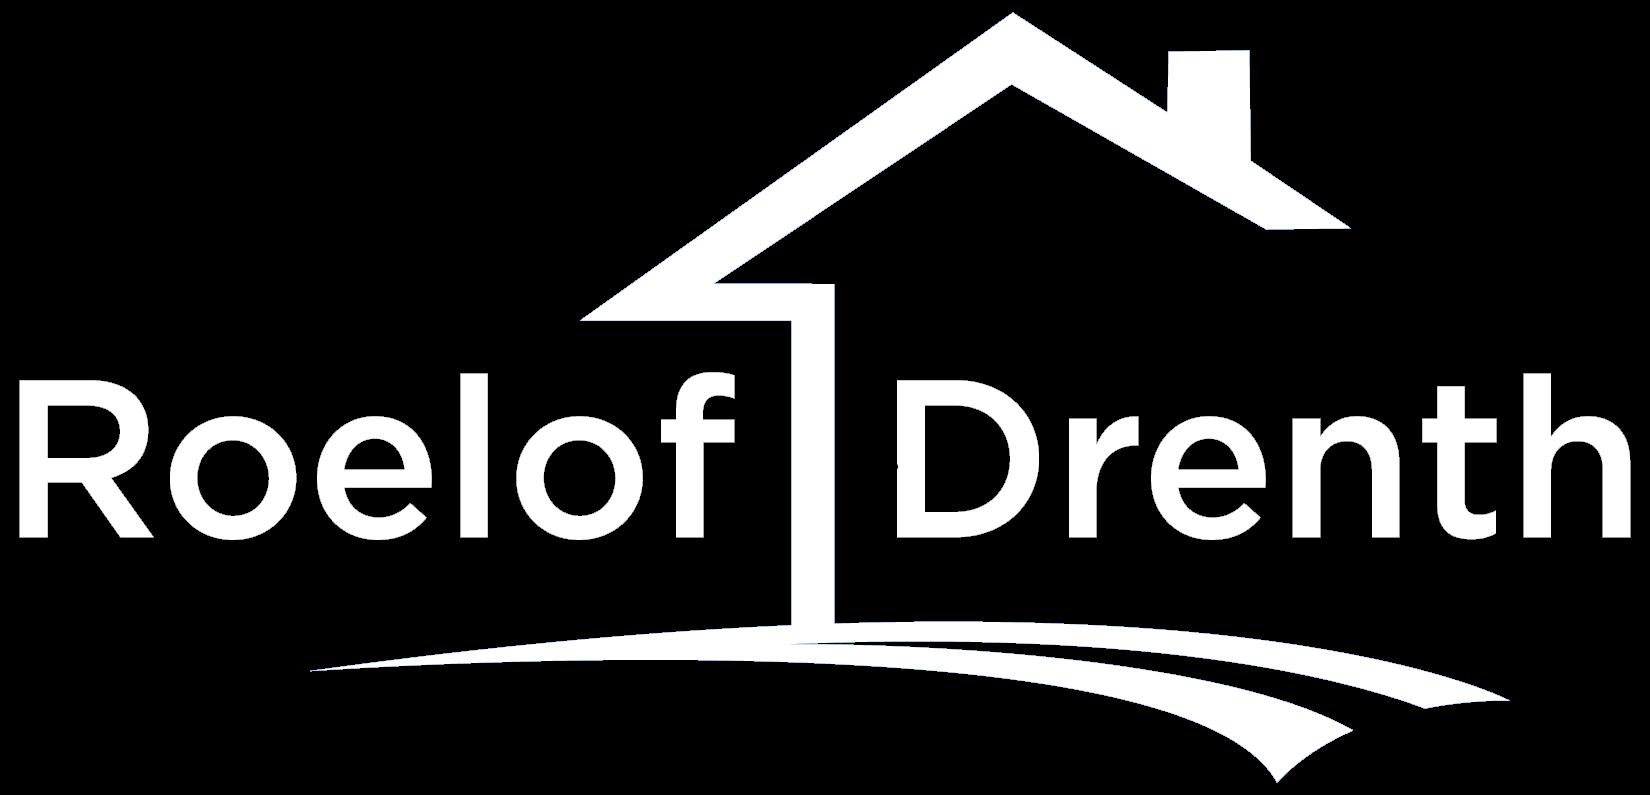 Roelof Drenth (707) 331-0333